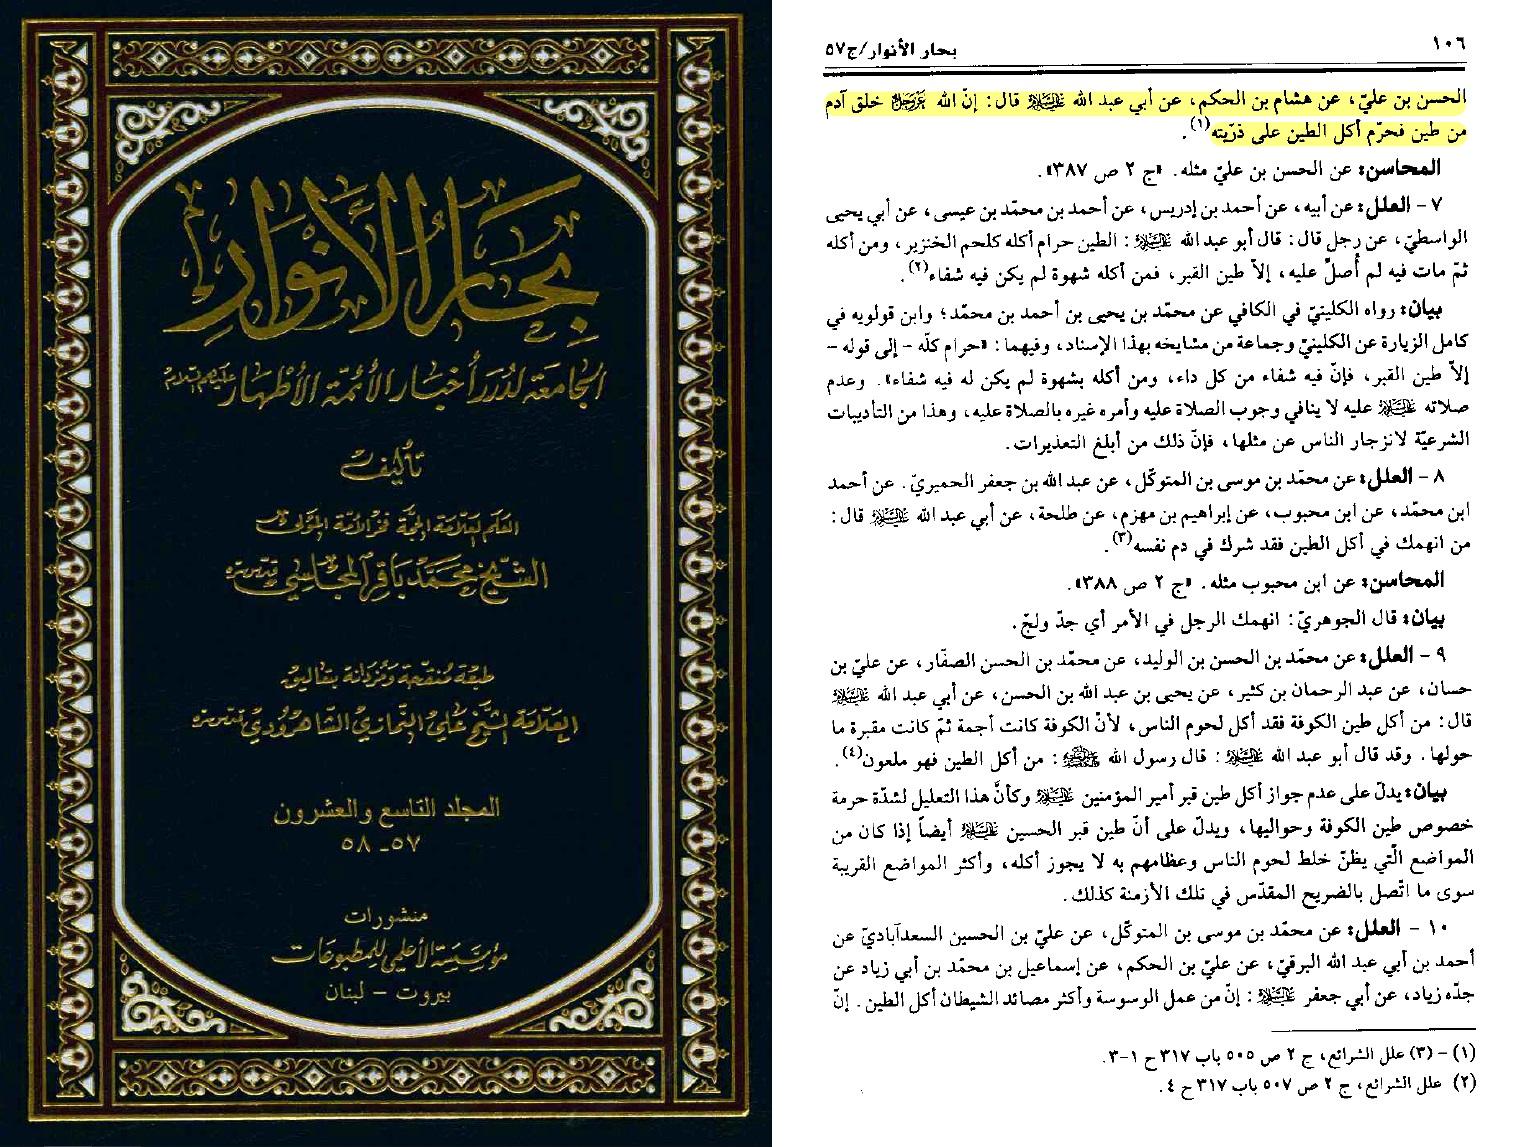 sa7i7-e-be7ar-band-57-seite-106-hadith-6